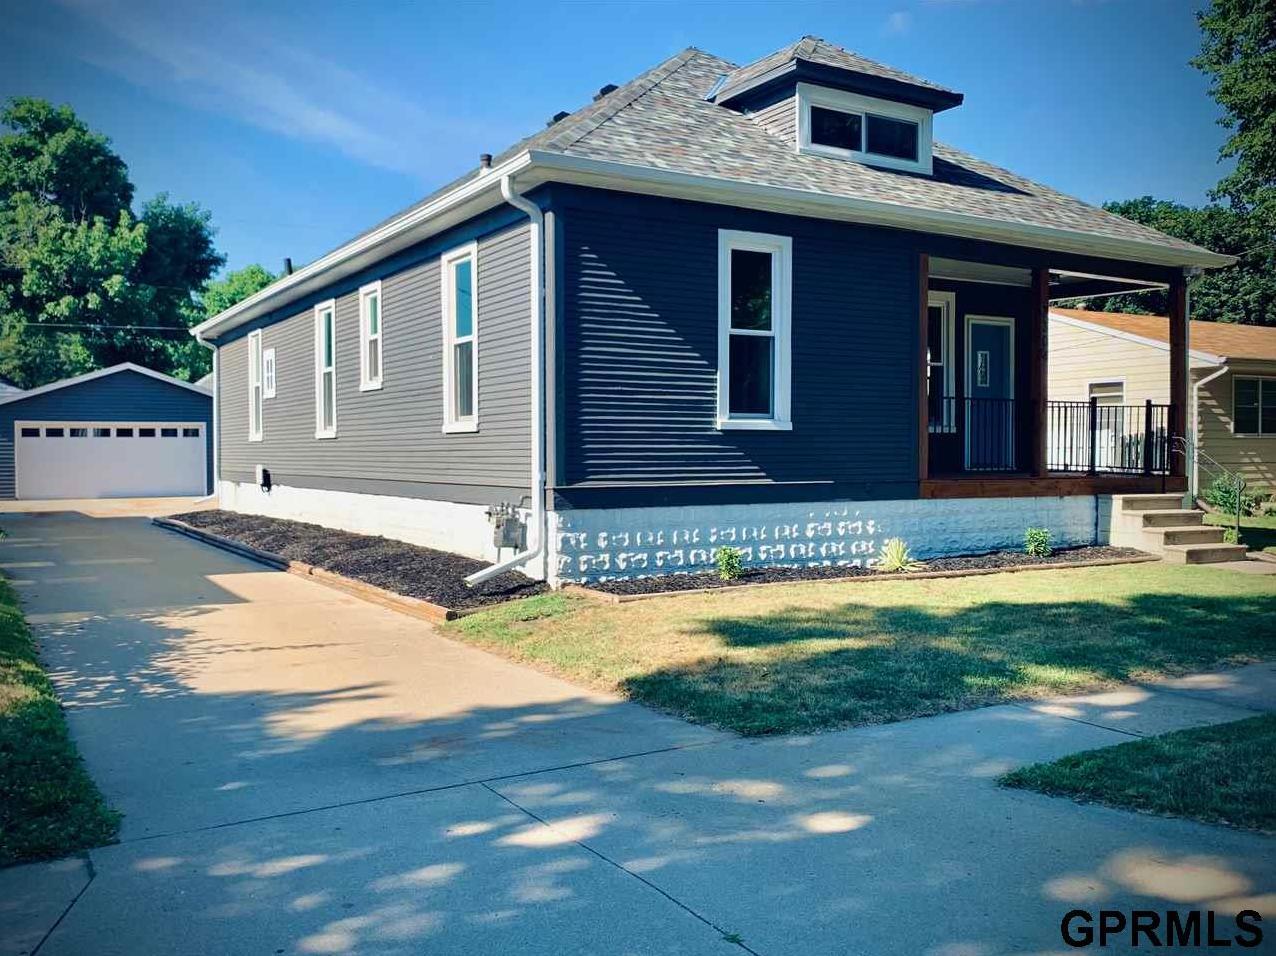 Photo of 3304 Avenue D Avenue Council Bluffs IA 51501